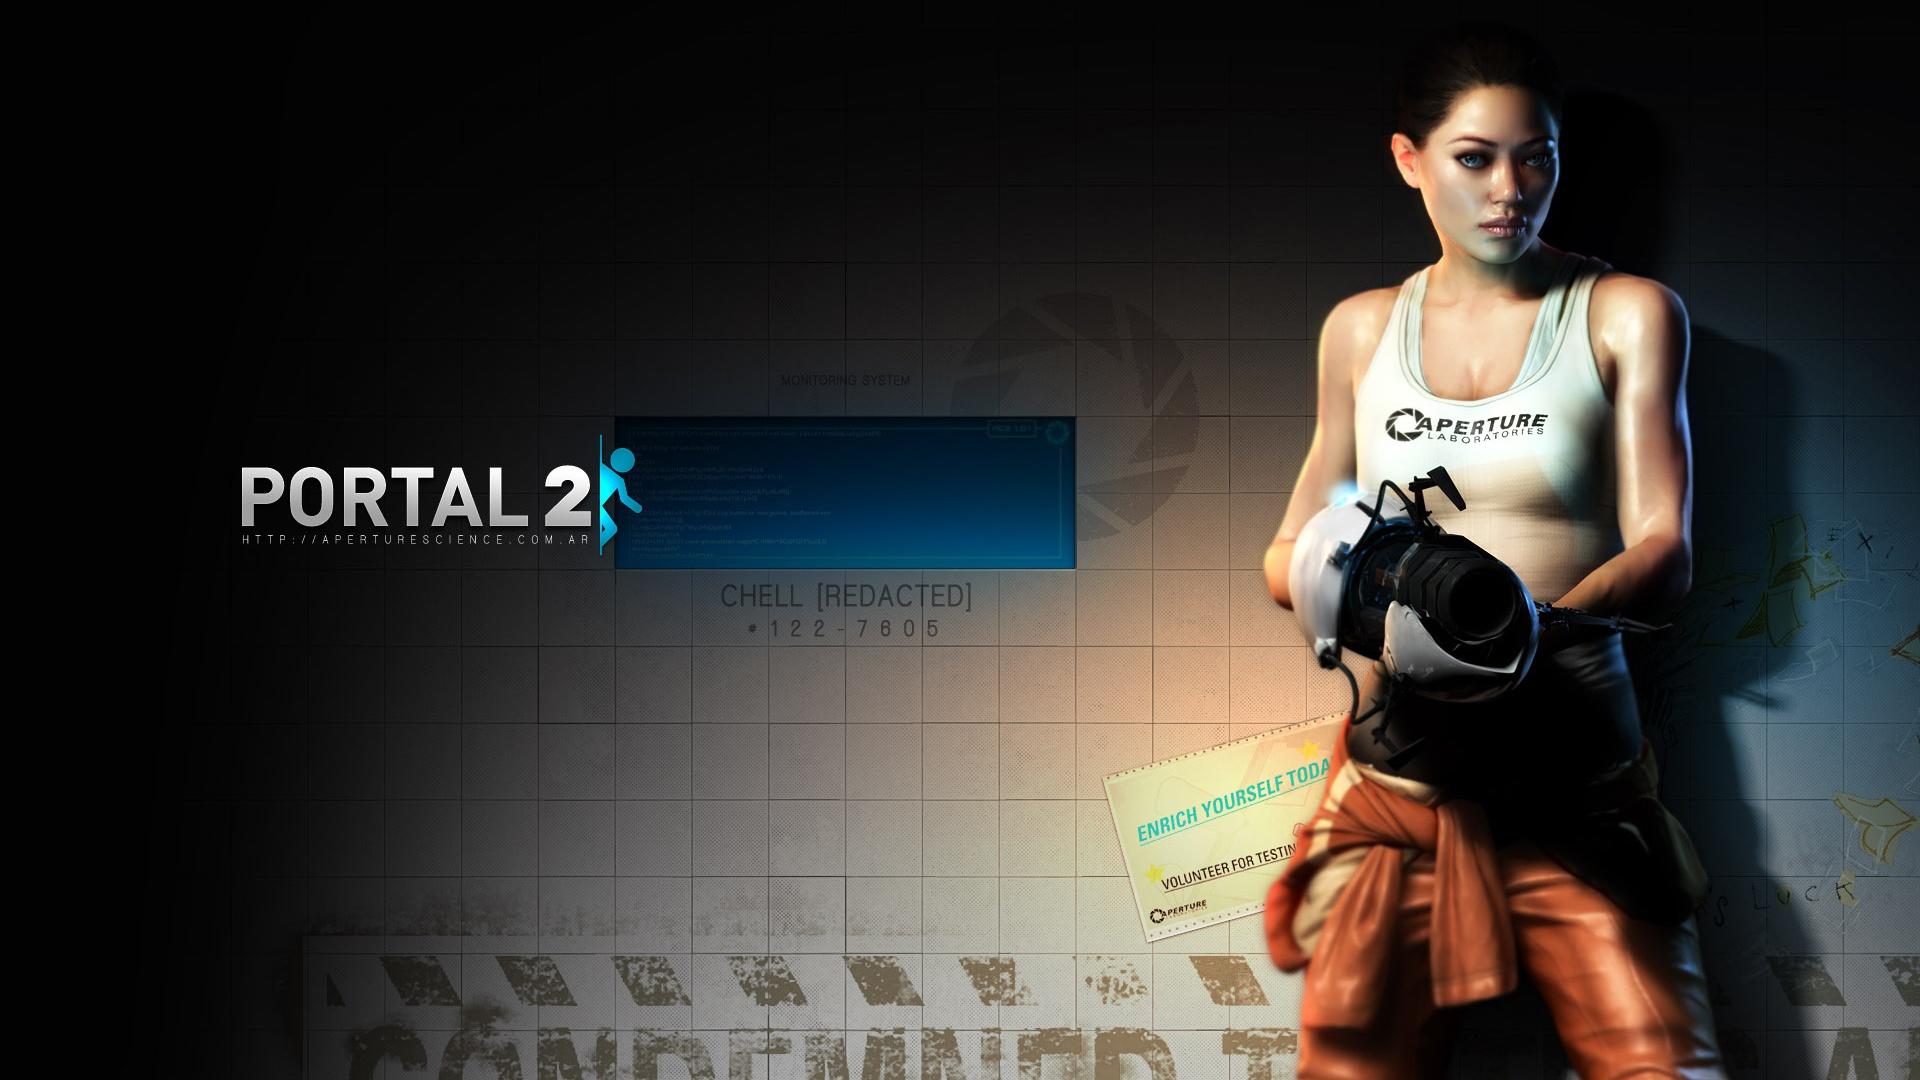 Portal 2 Desktop Wallpapers FREE on Latorocom 1920x1080